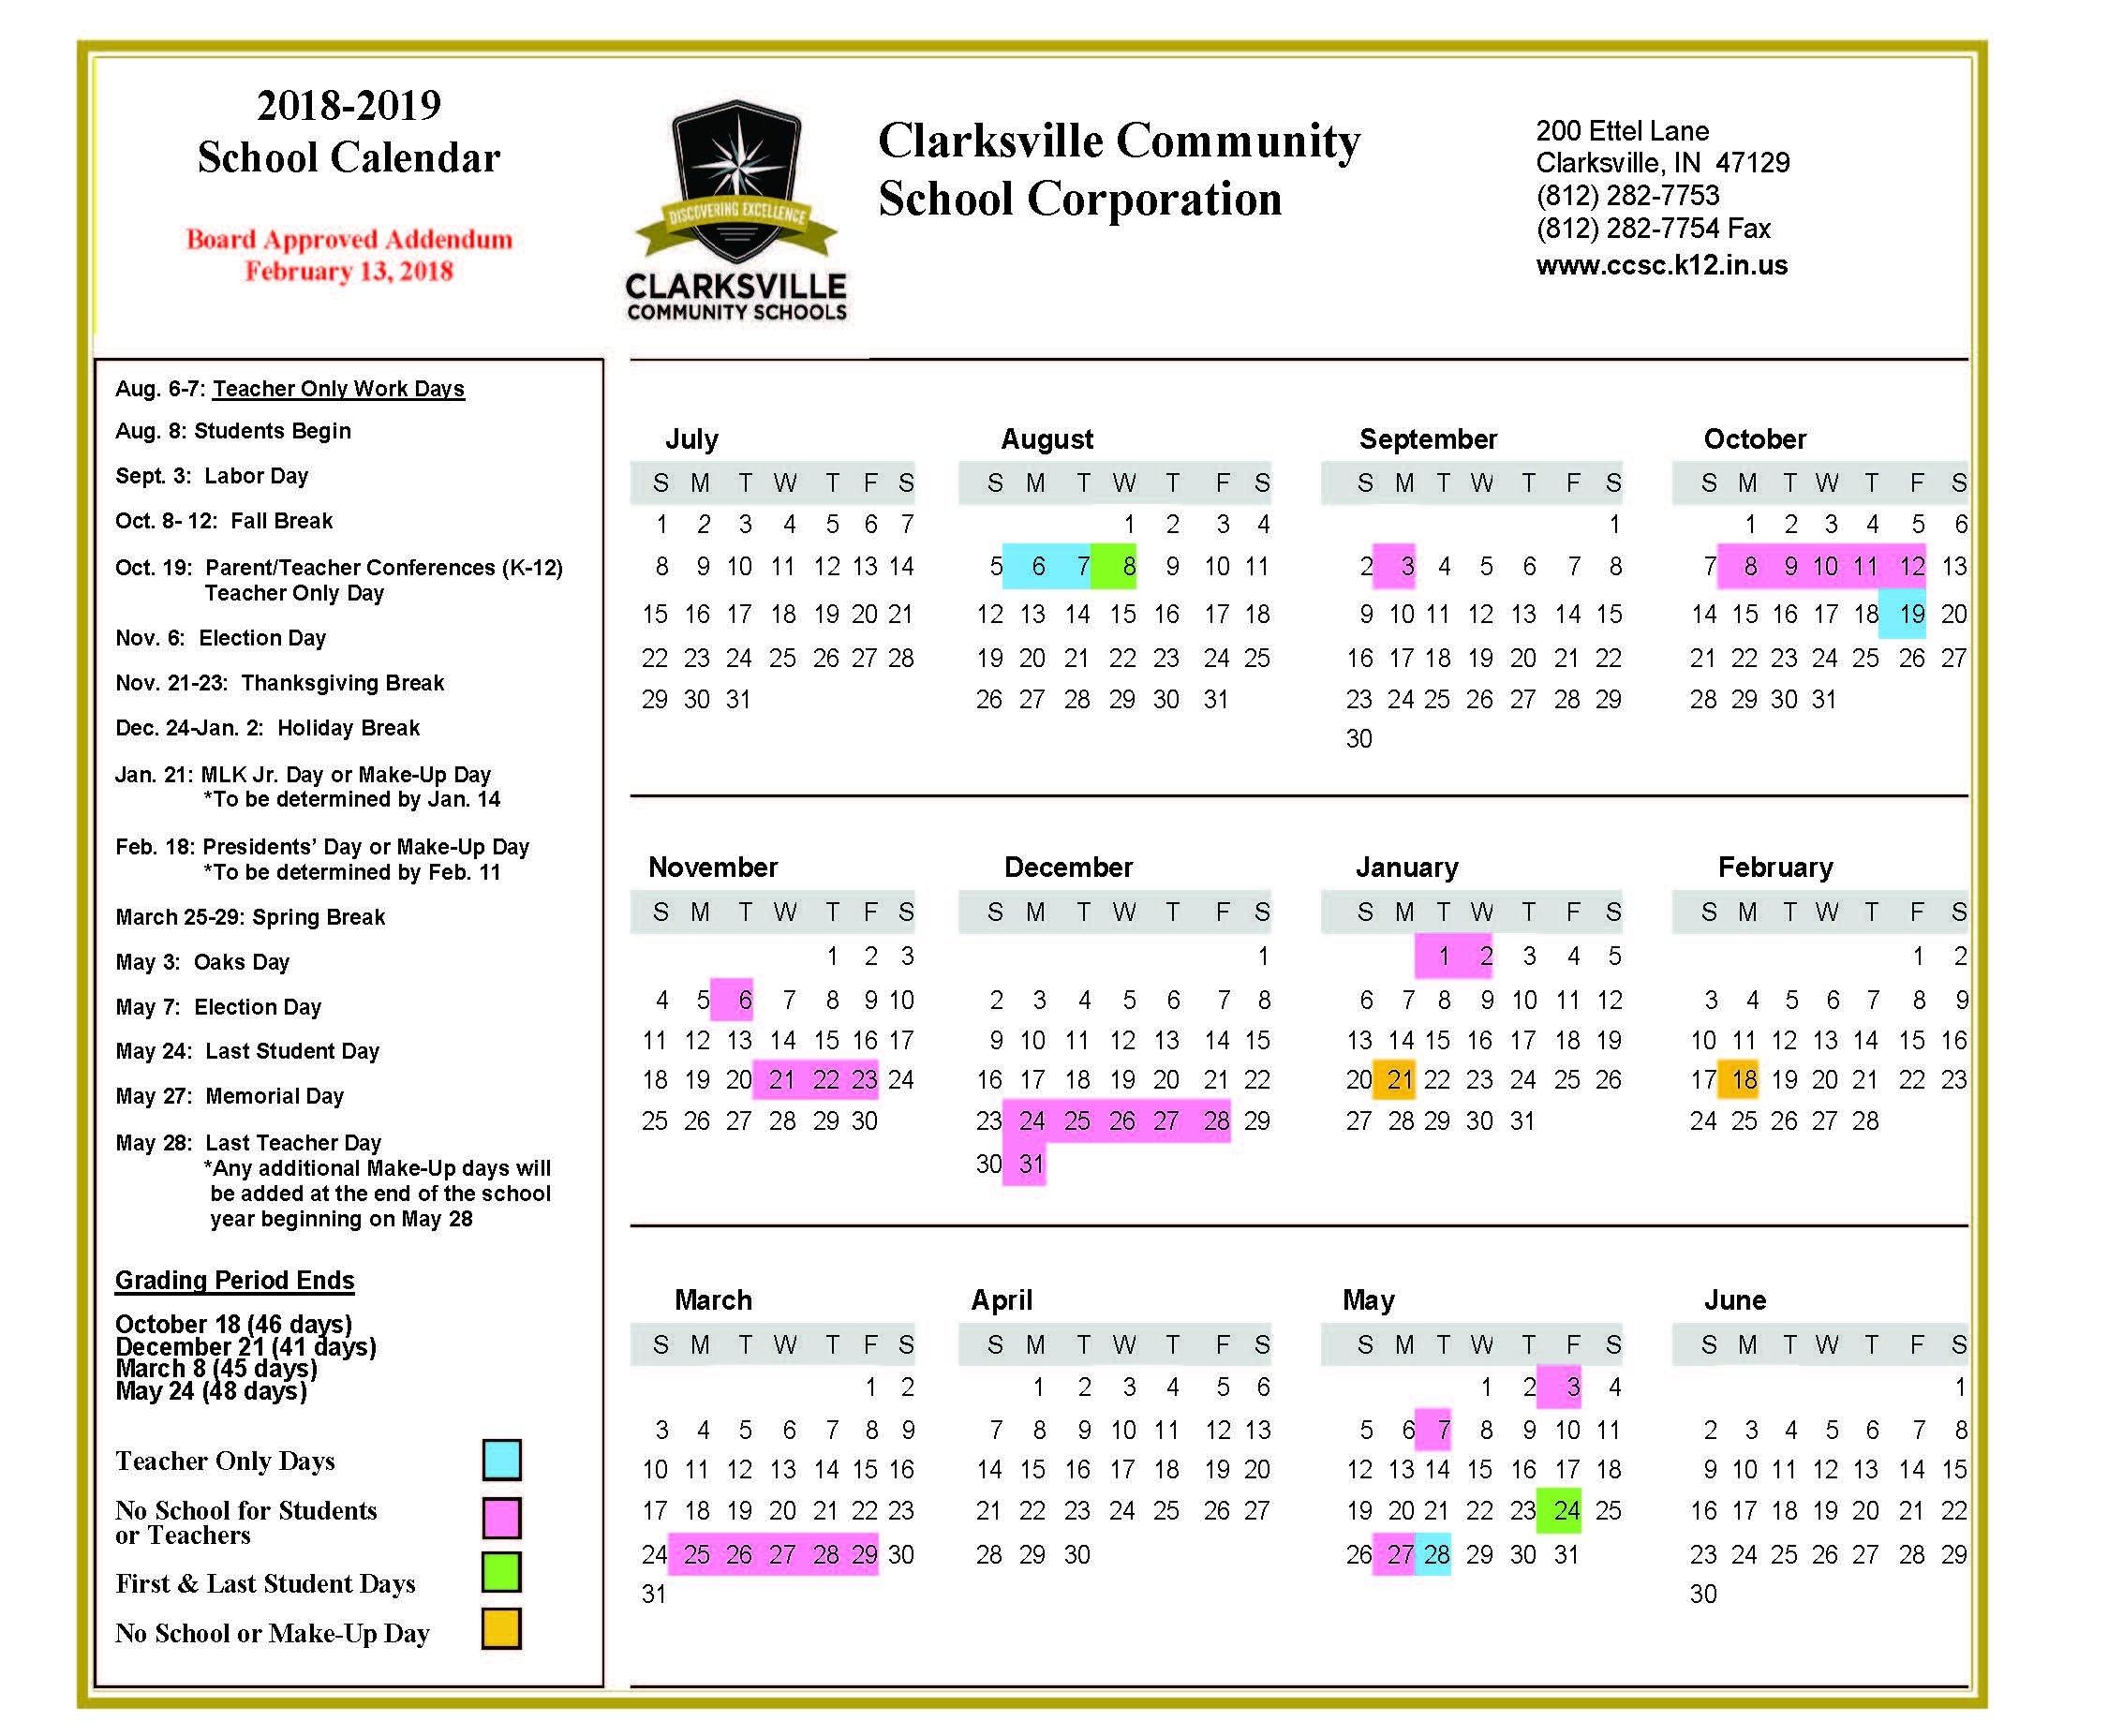 2018 2019 School Calendar Approvedboard | Clarksville Community School Calendar 2019 20